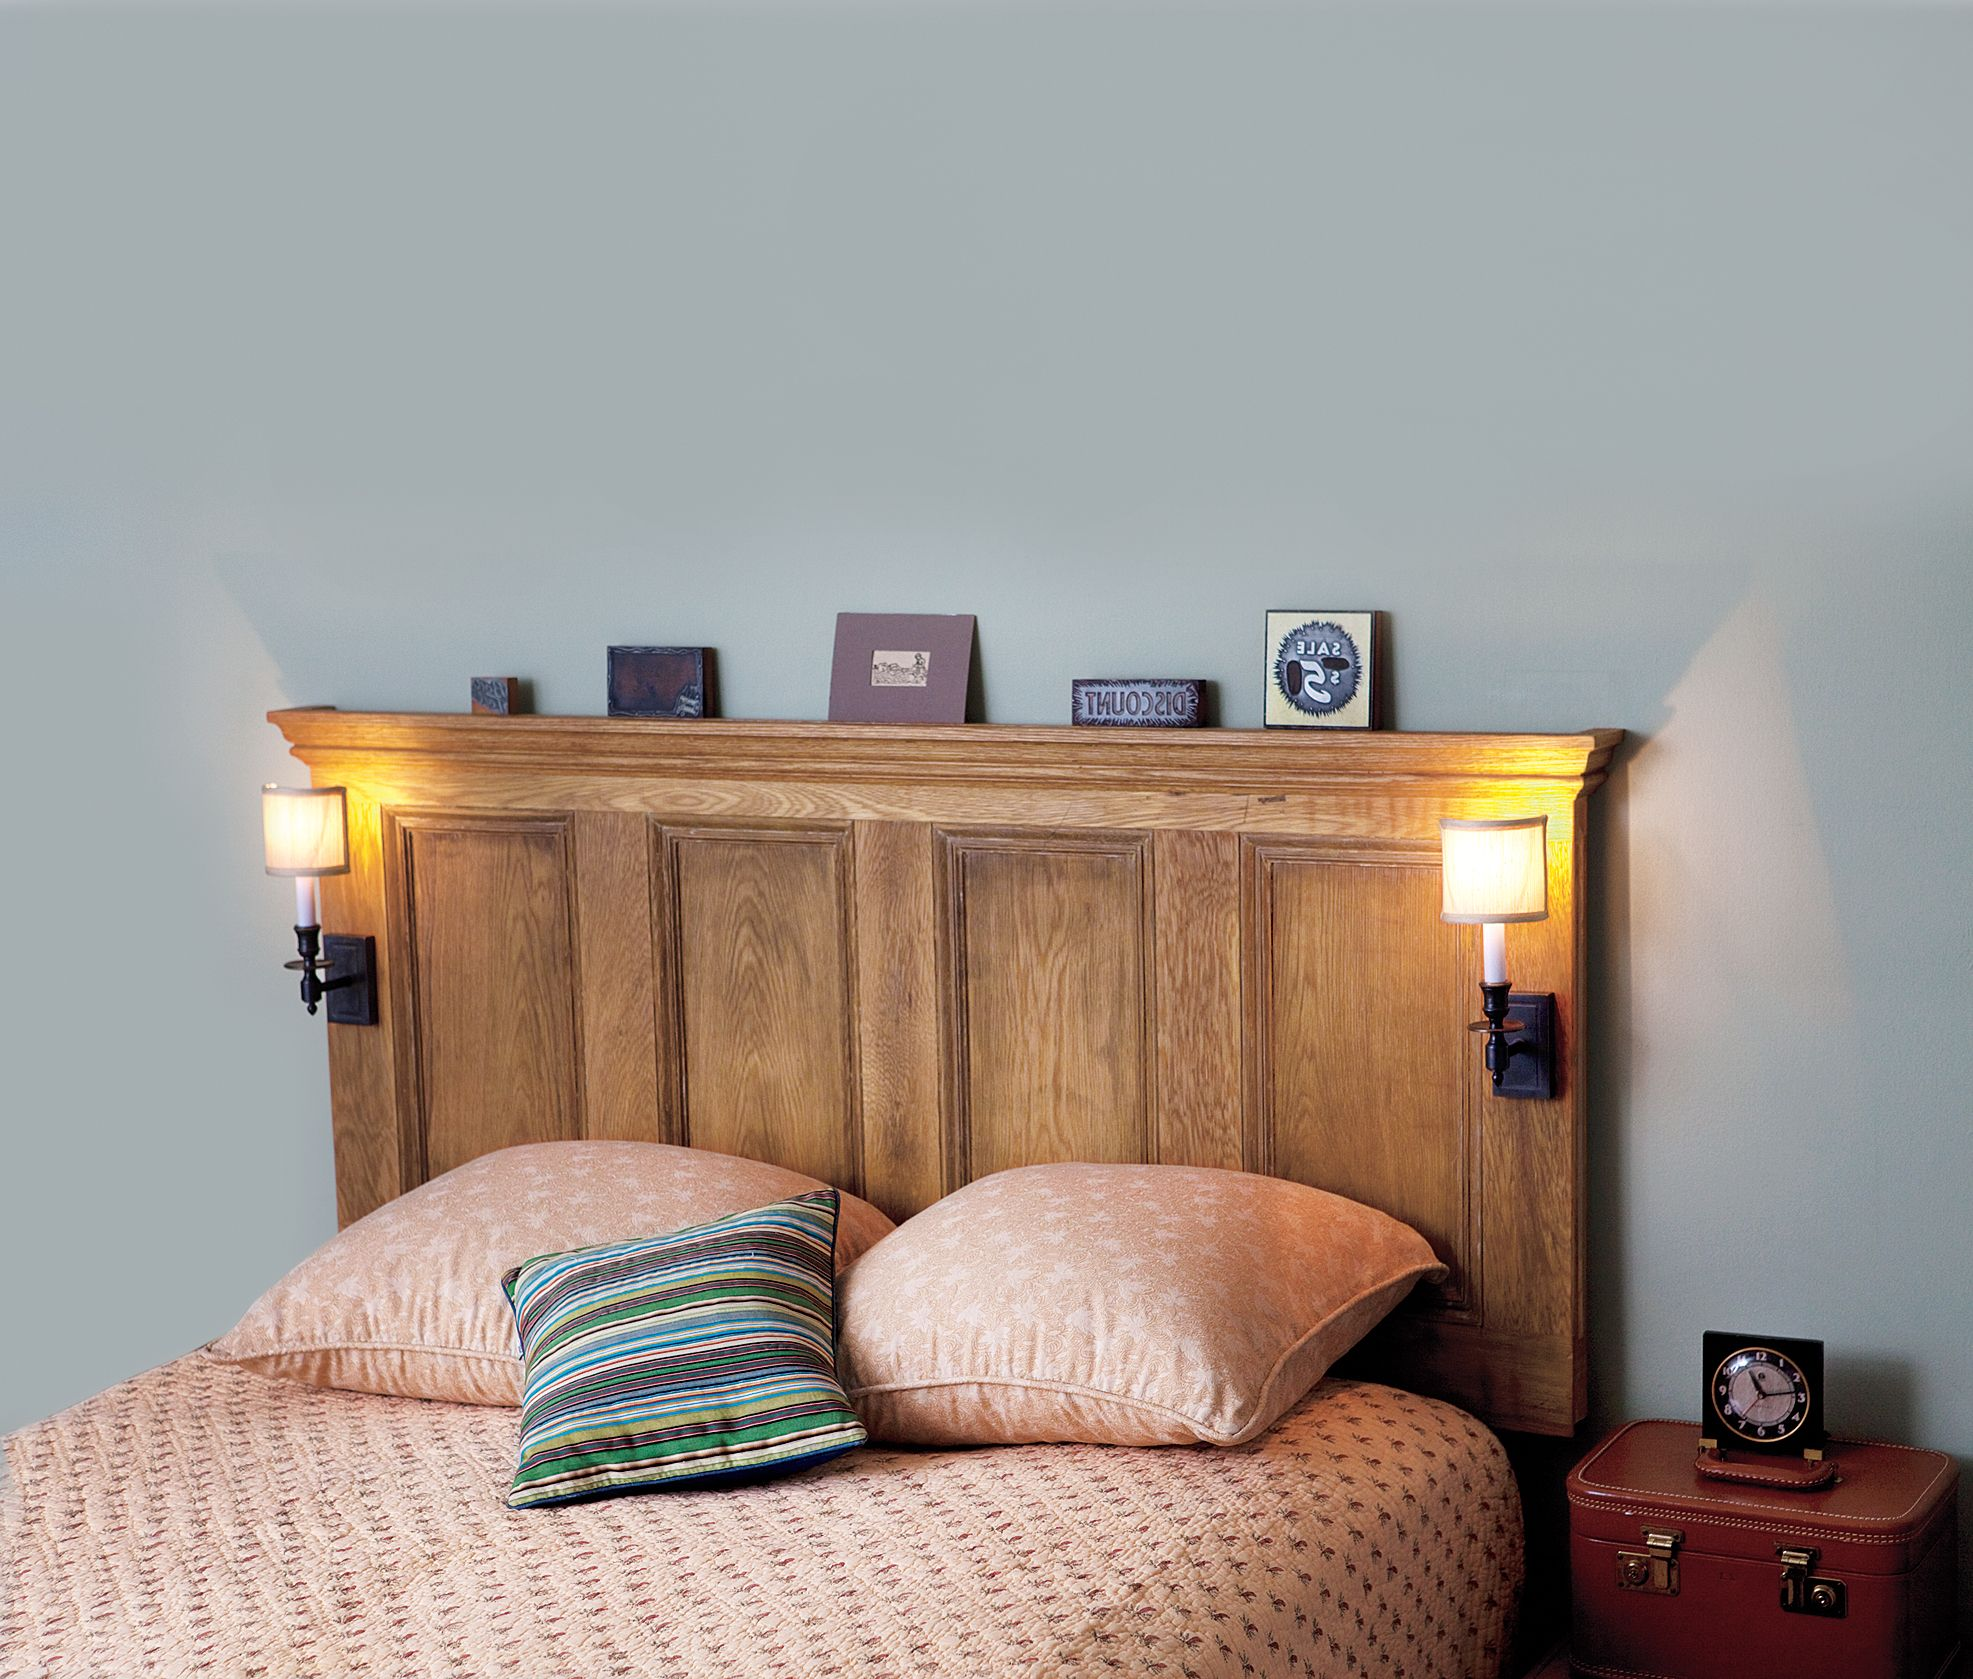 Wunderbar Hausgemachte Kopfbretter · Kopfteil Mit Lampen · An Interior Door  Made Into A Headboard